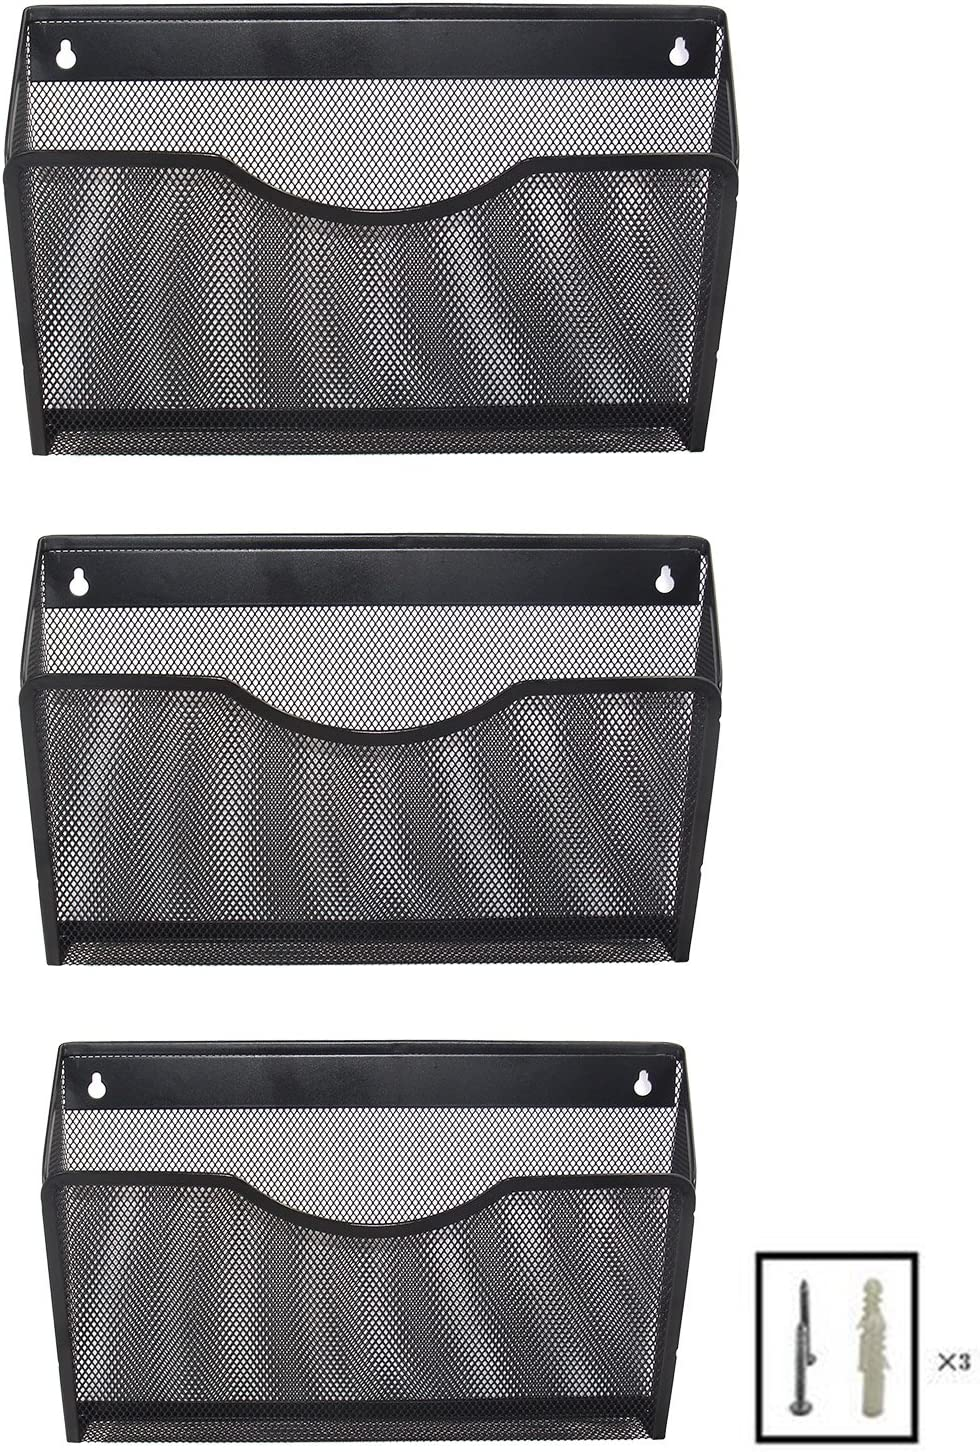 EasyPAG Mesh Wall File Folder Hanging Holder Orga Pockets Super-cheap Max 54% OFF 3